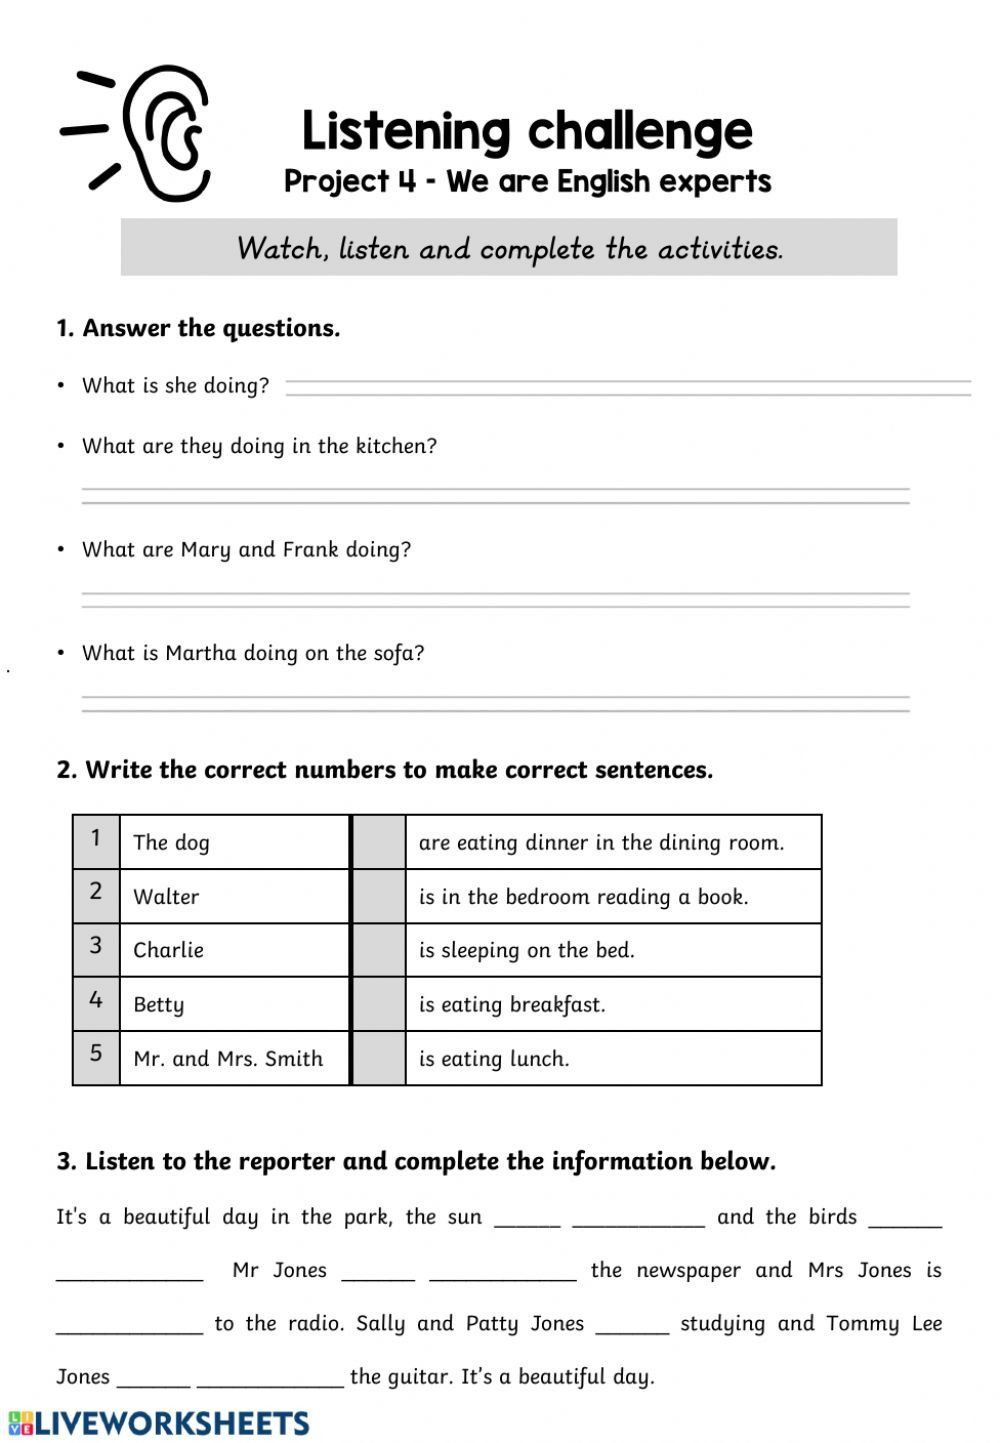 Present Progressive Spanish Worksheet Answers Present Progressive Listening Prehension Interacti In 2020 Listening Comprehension Comprehension Comprehension Worksheets